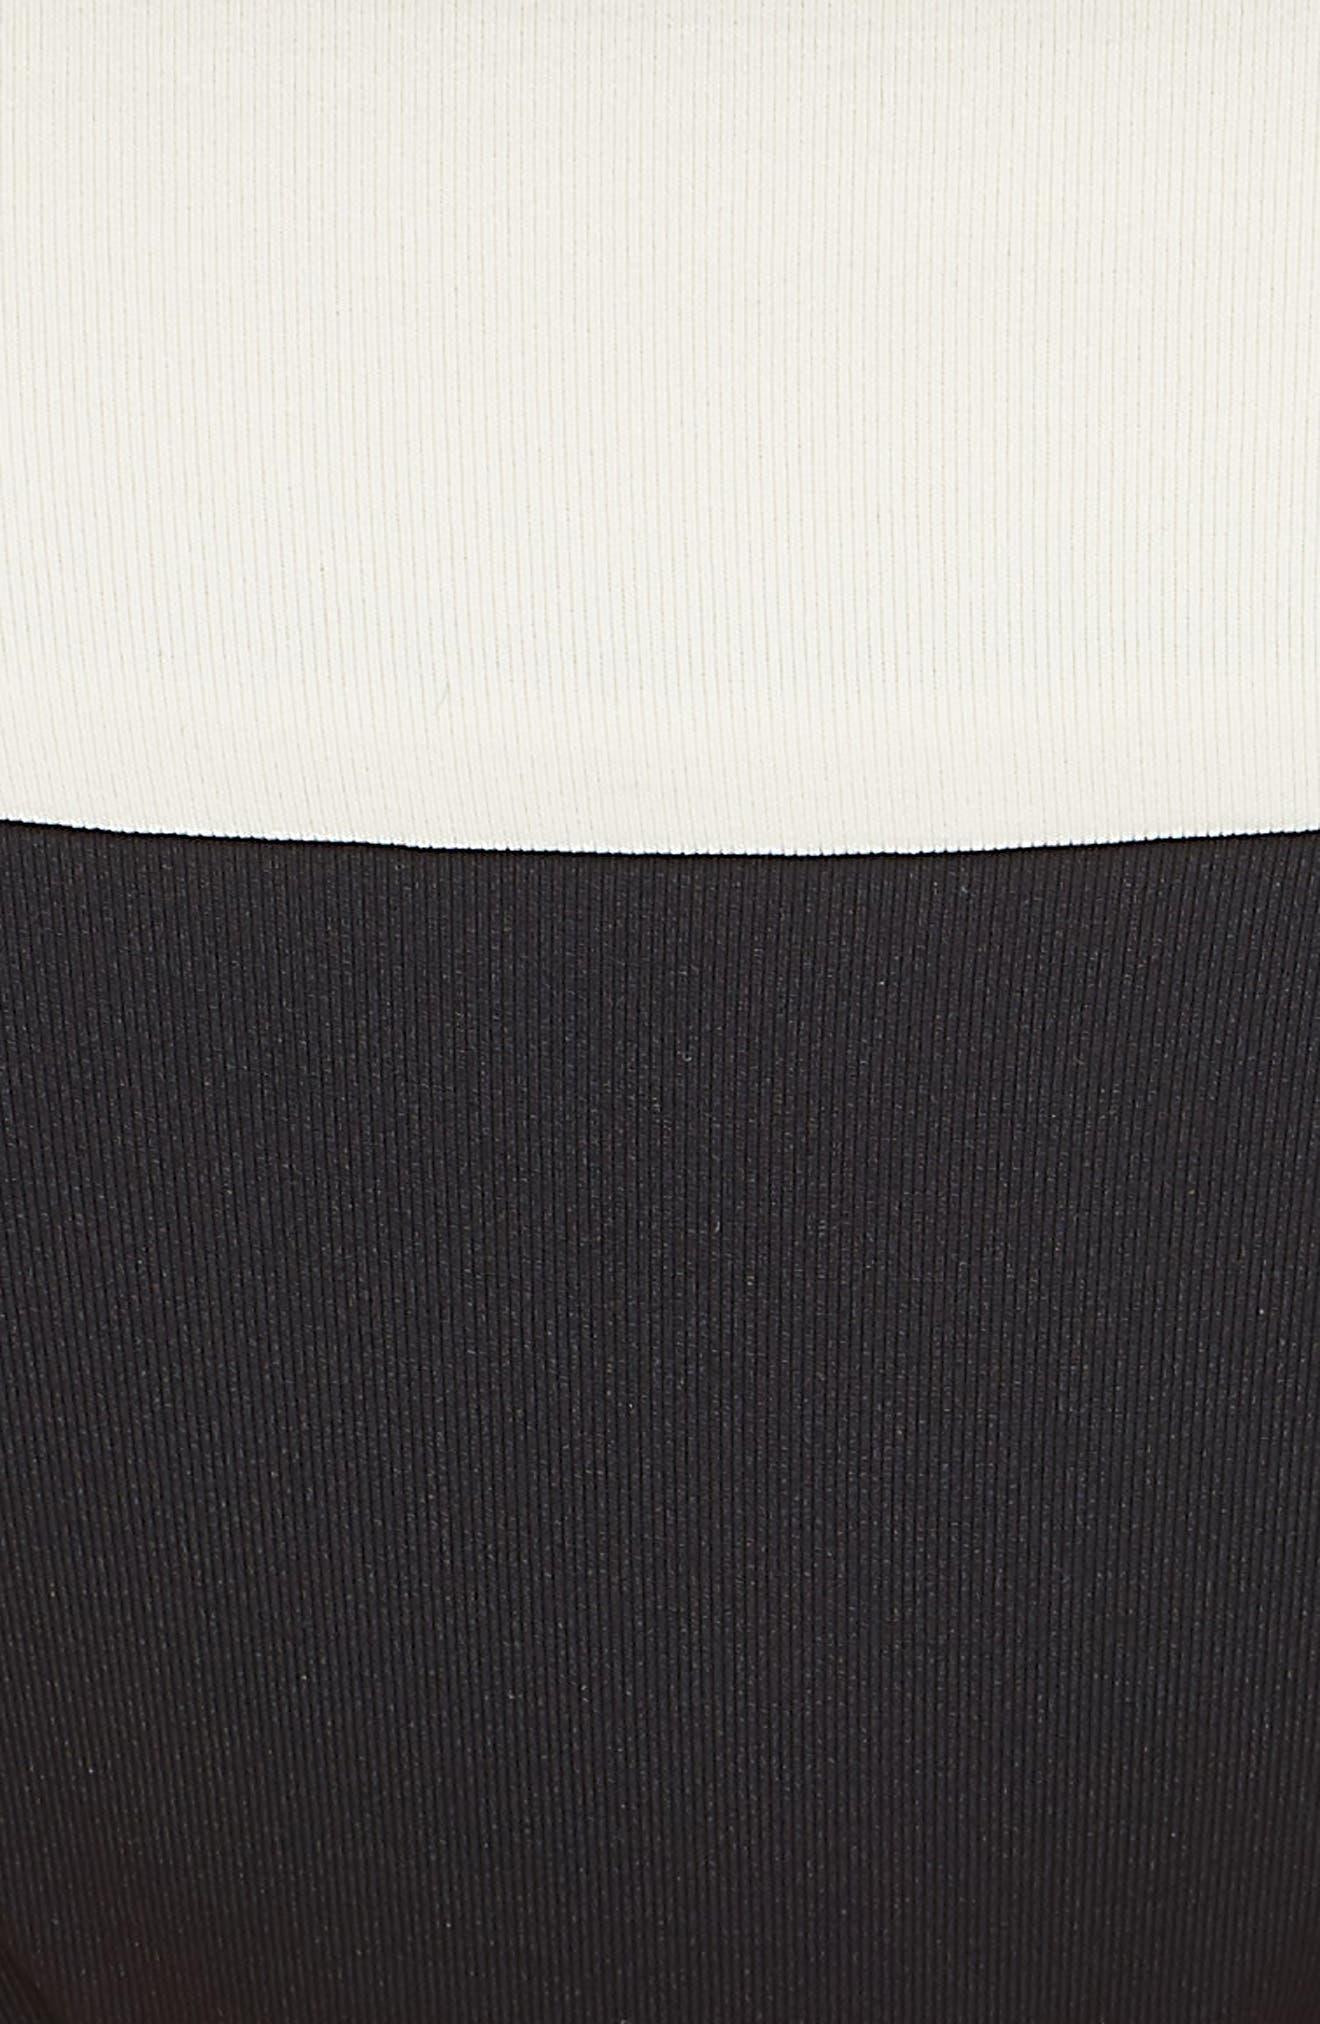 Reversible Bikini Bottom,                             Alternate thumbnail 5, color,                             CREAM/ BLACK/ CAMEL